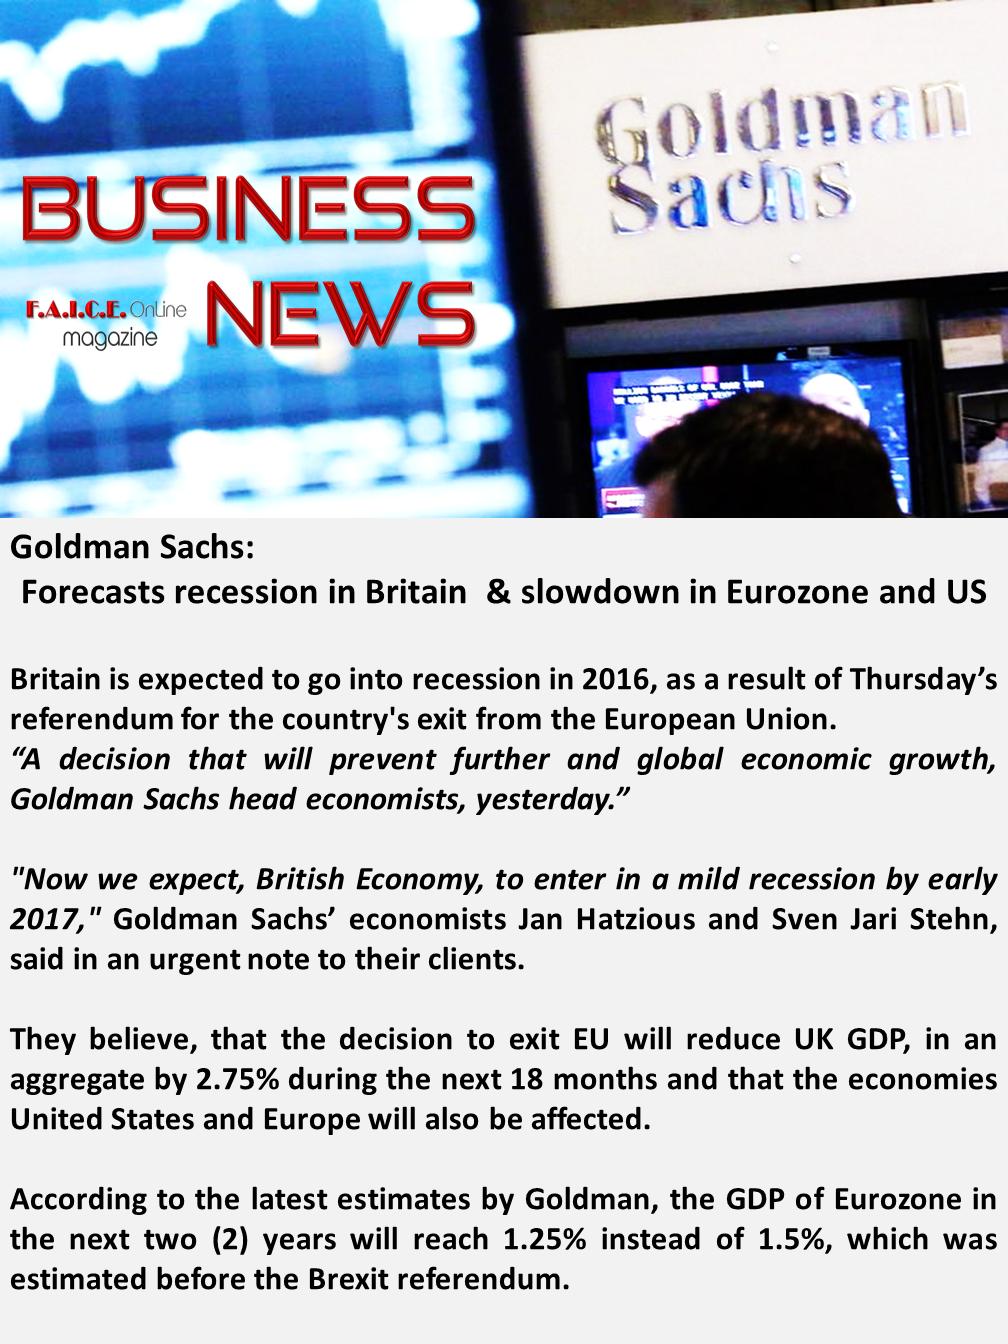 Goldman Sachs Reports